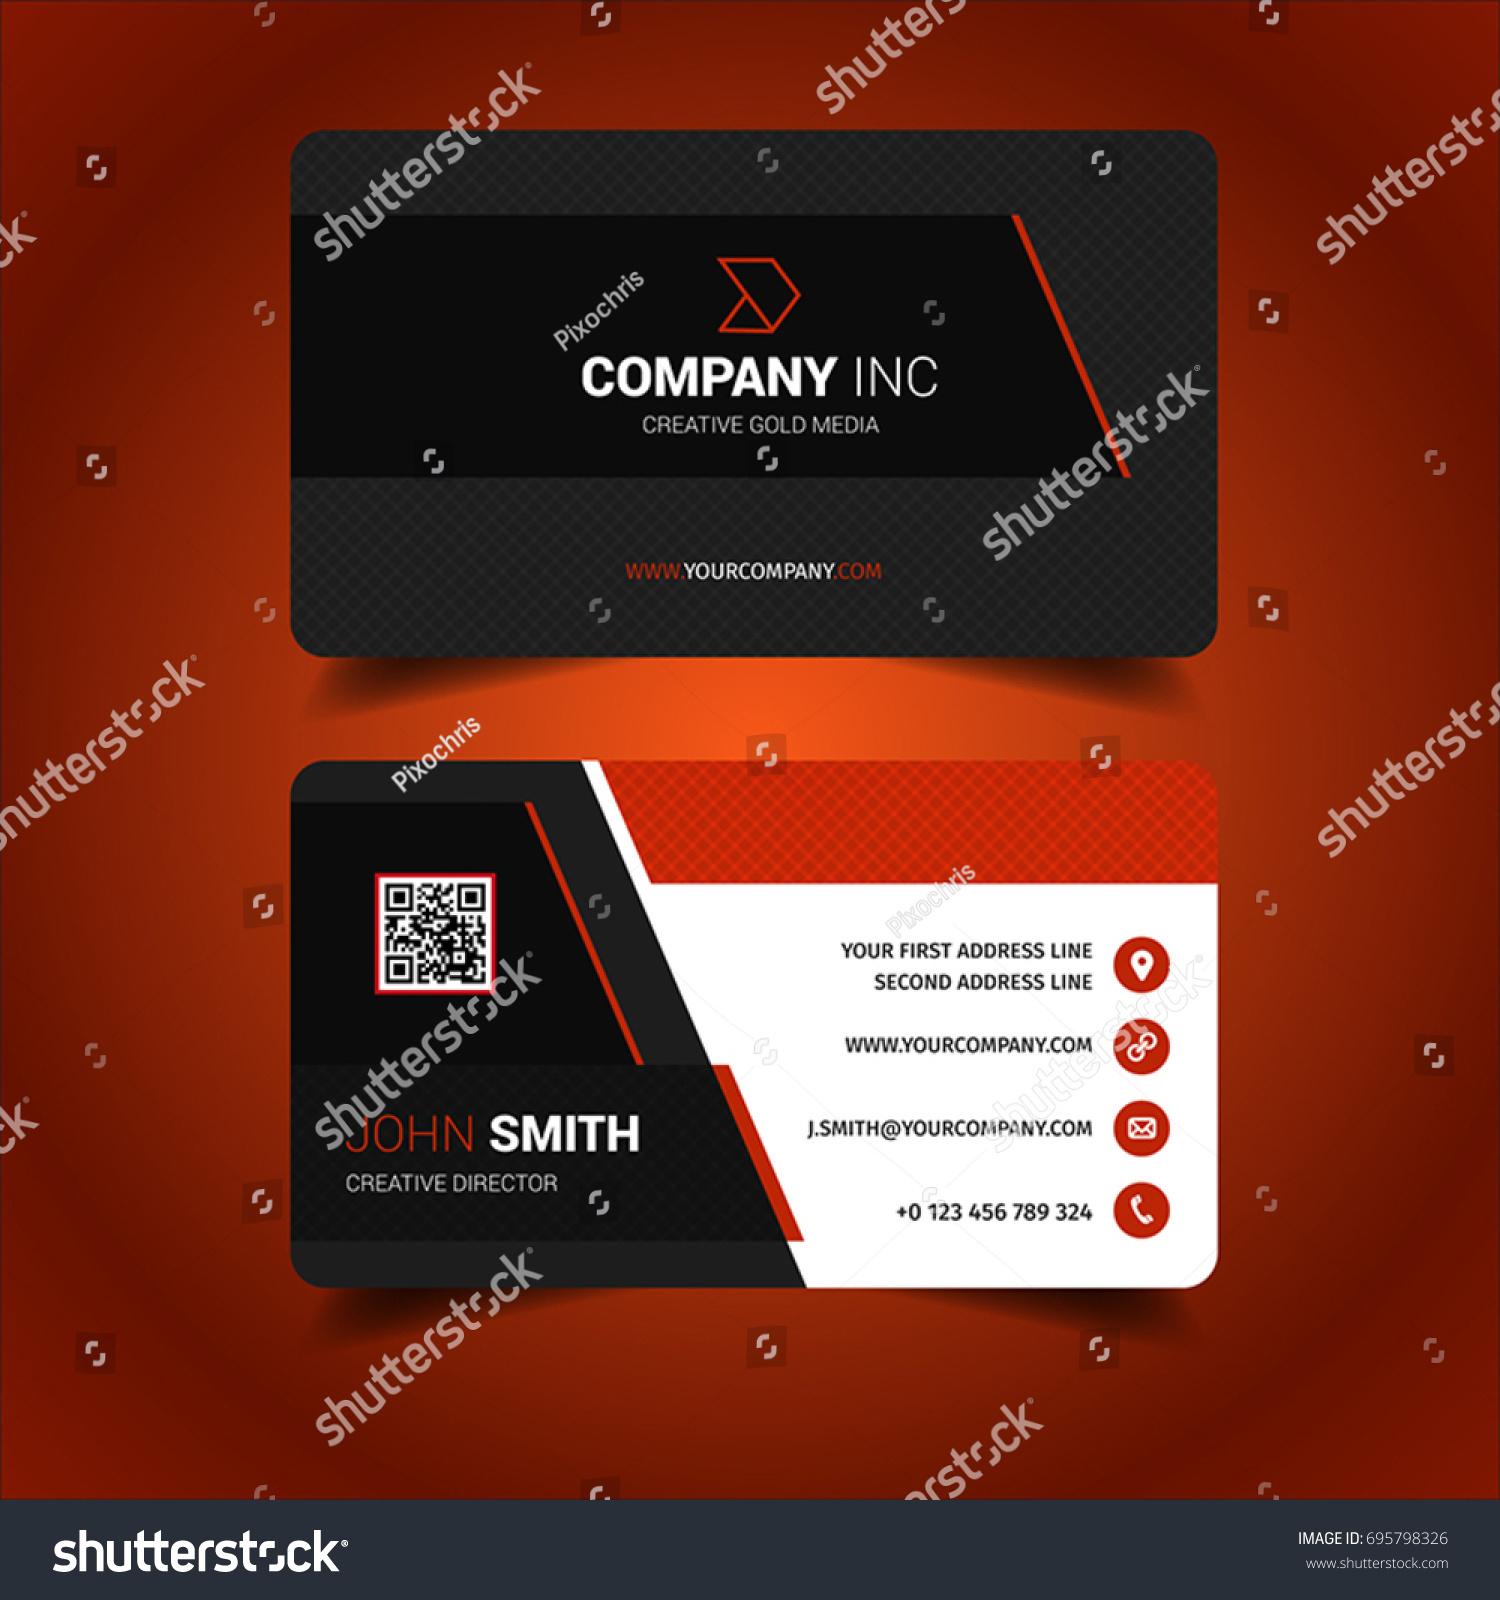 Black Red Business Card Stock Vector 695798326 - Shutterstock